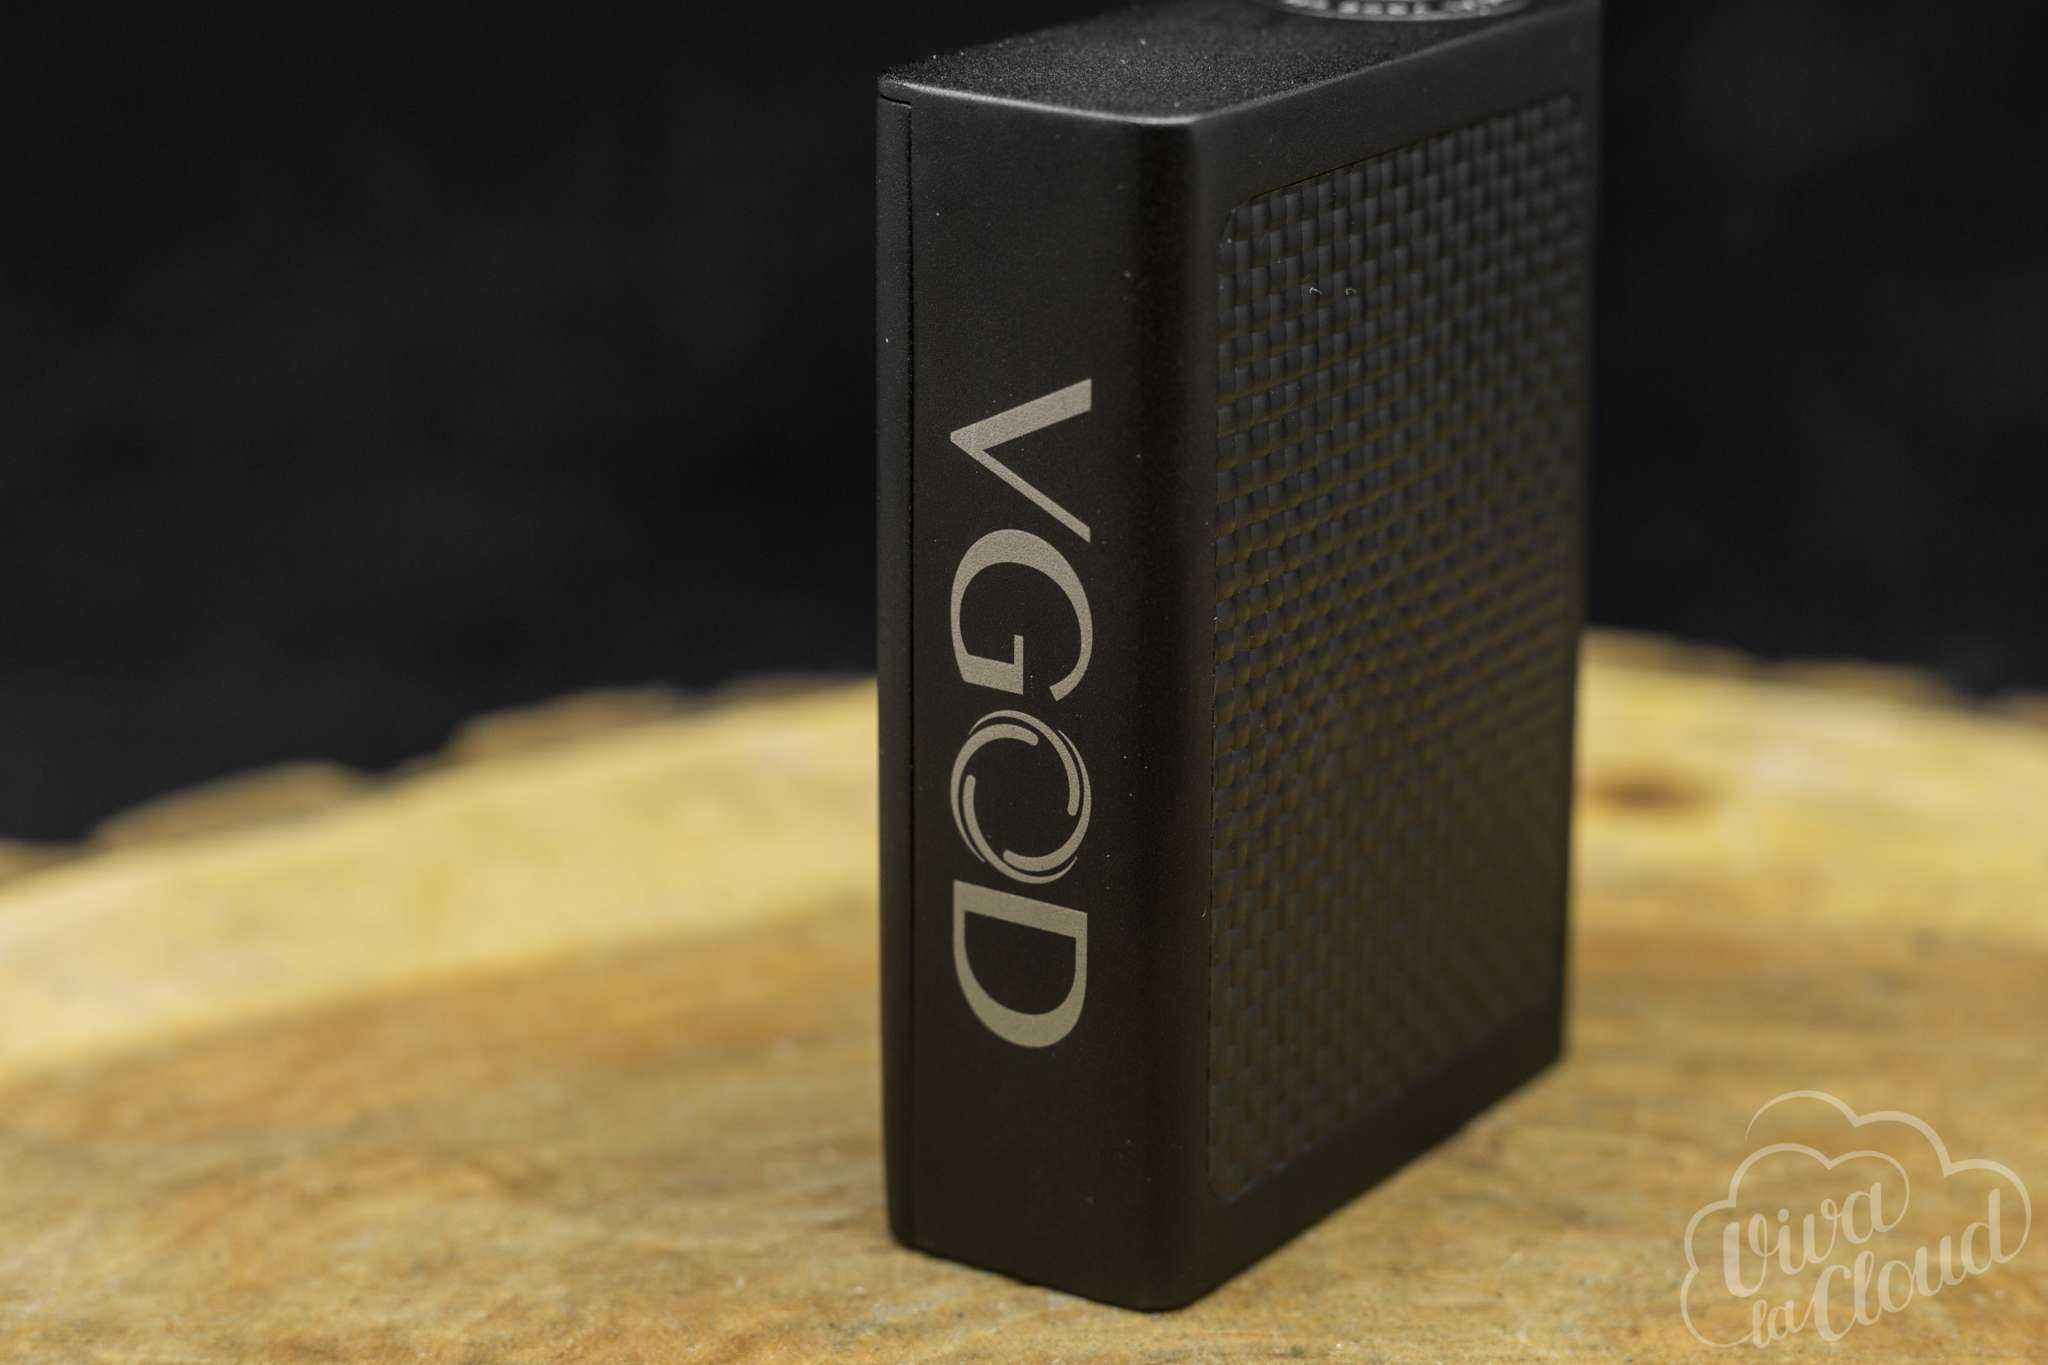 vgod-pro-box-11